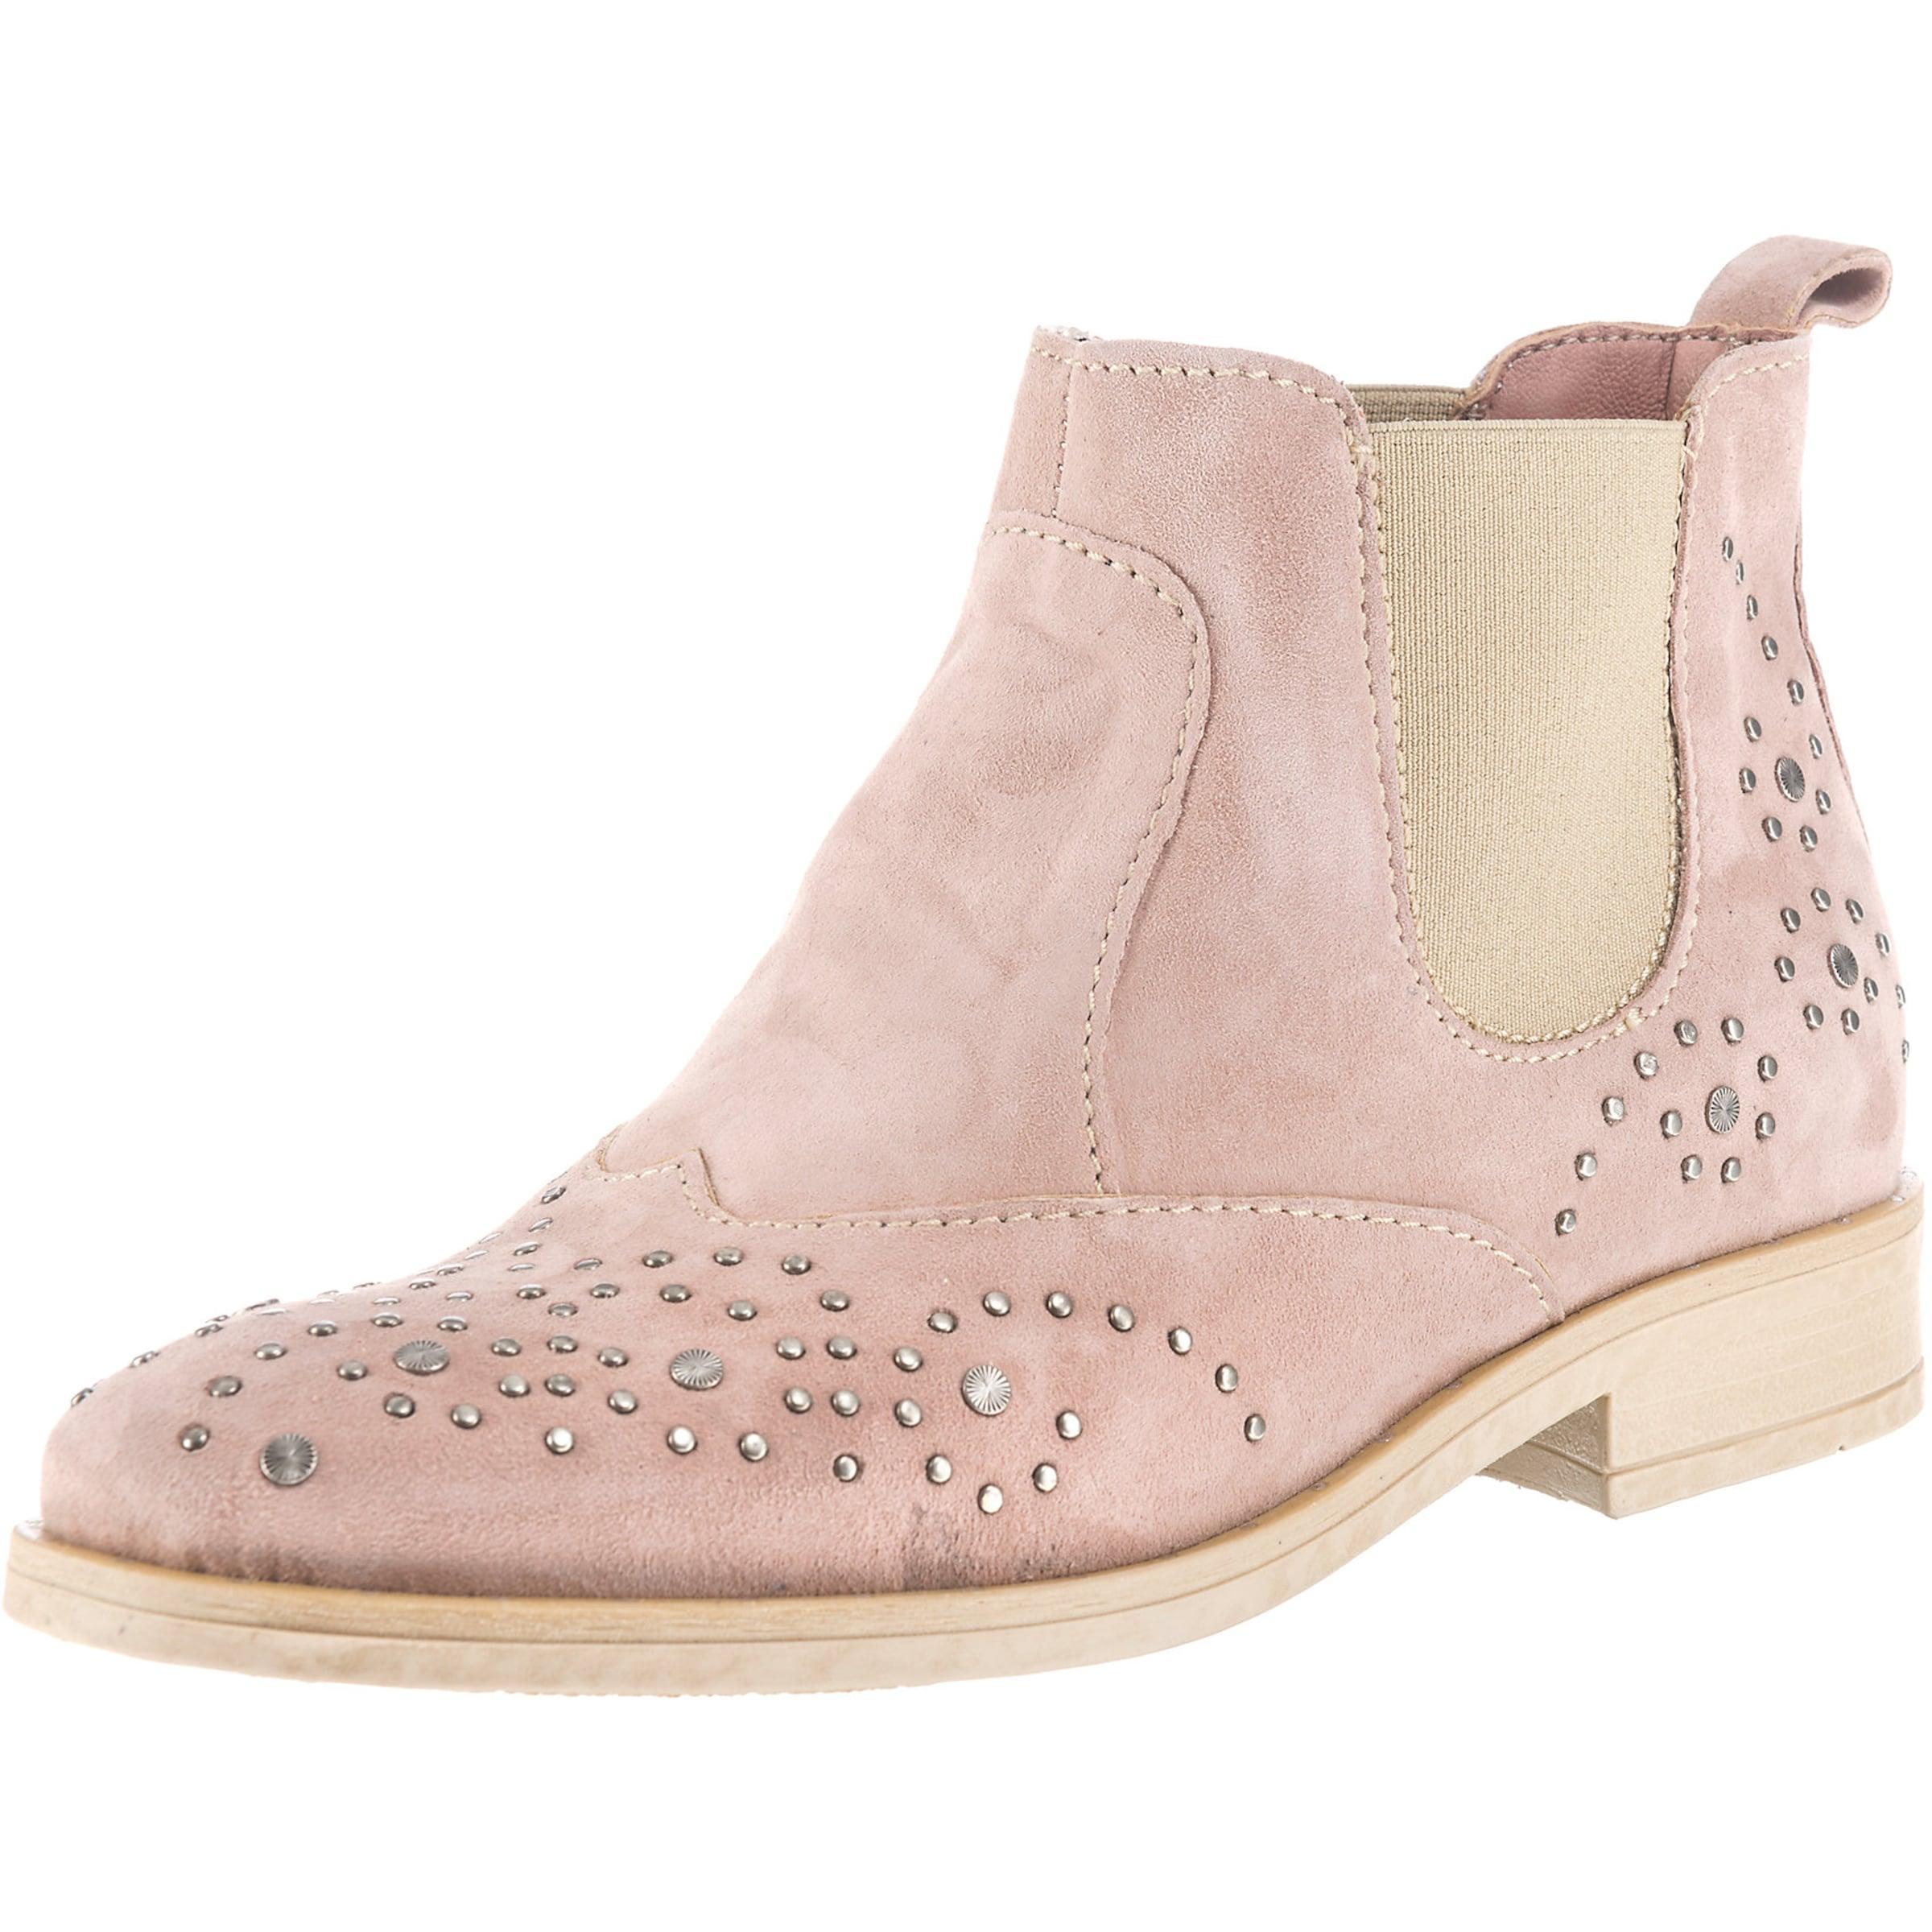 MJUS Est Chelsea Boots Bester Großhandel Günstig Kaufen Eastbay Perfekt Günstig Online poBeiaQwh